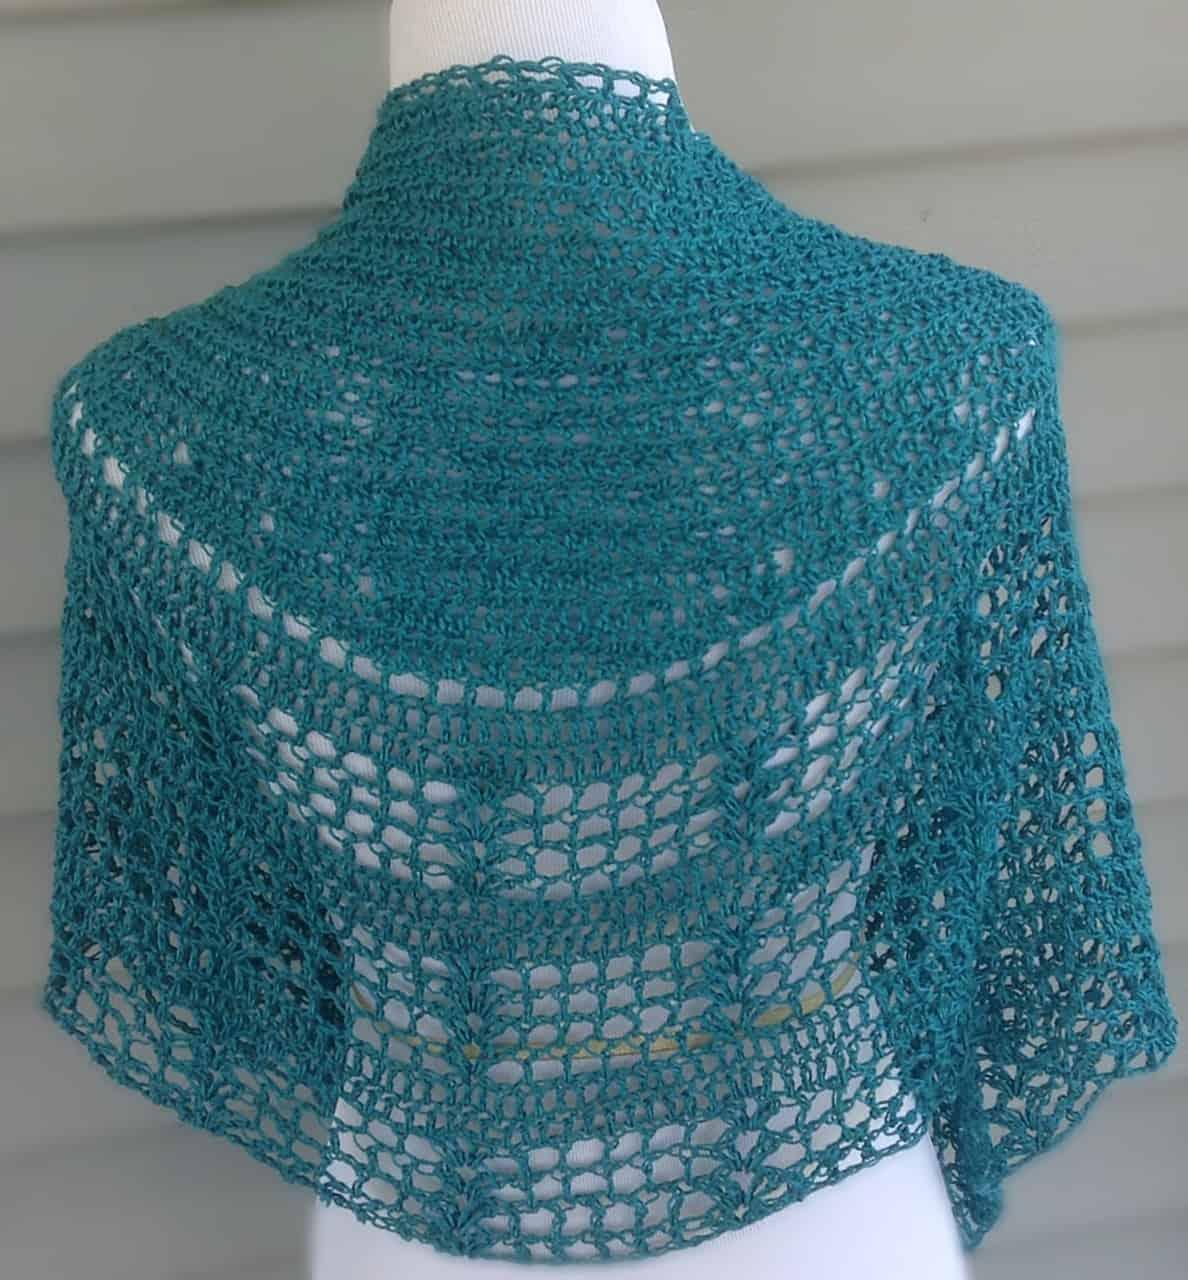 Tian Connaughton   Knit Designs by Tian   Leymus Shawl